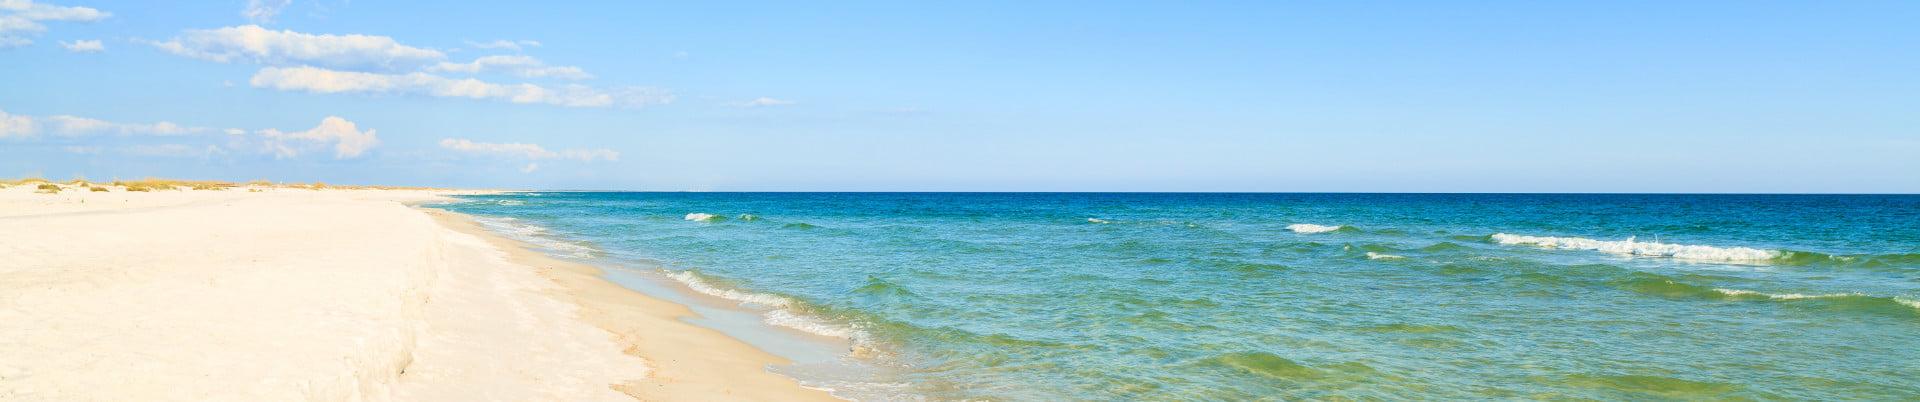 St George Island FL Sandy Beach and Water